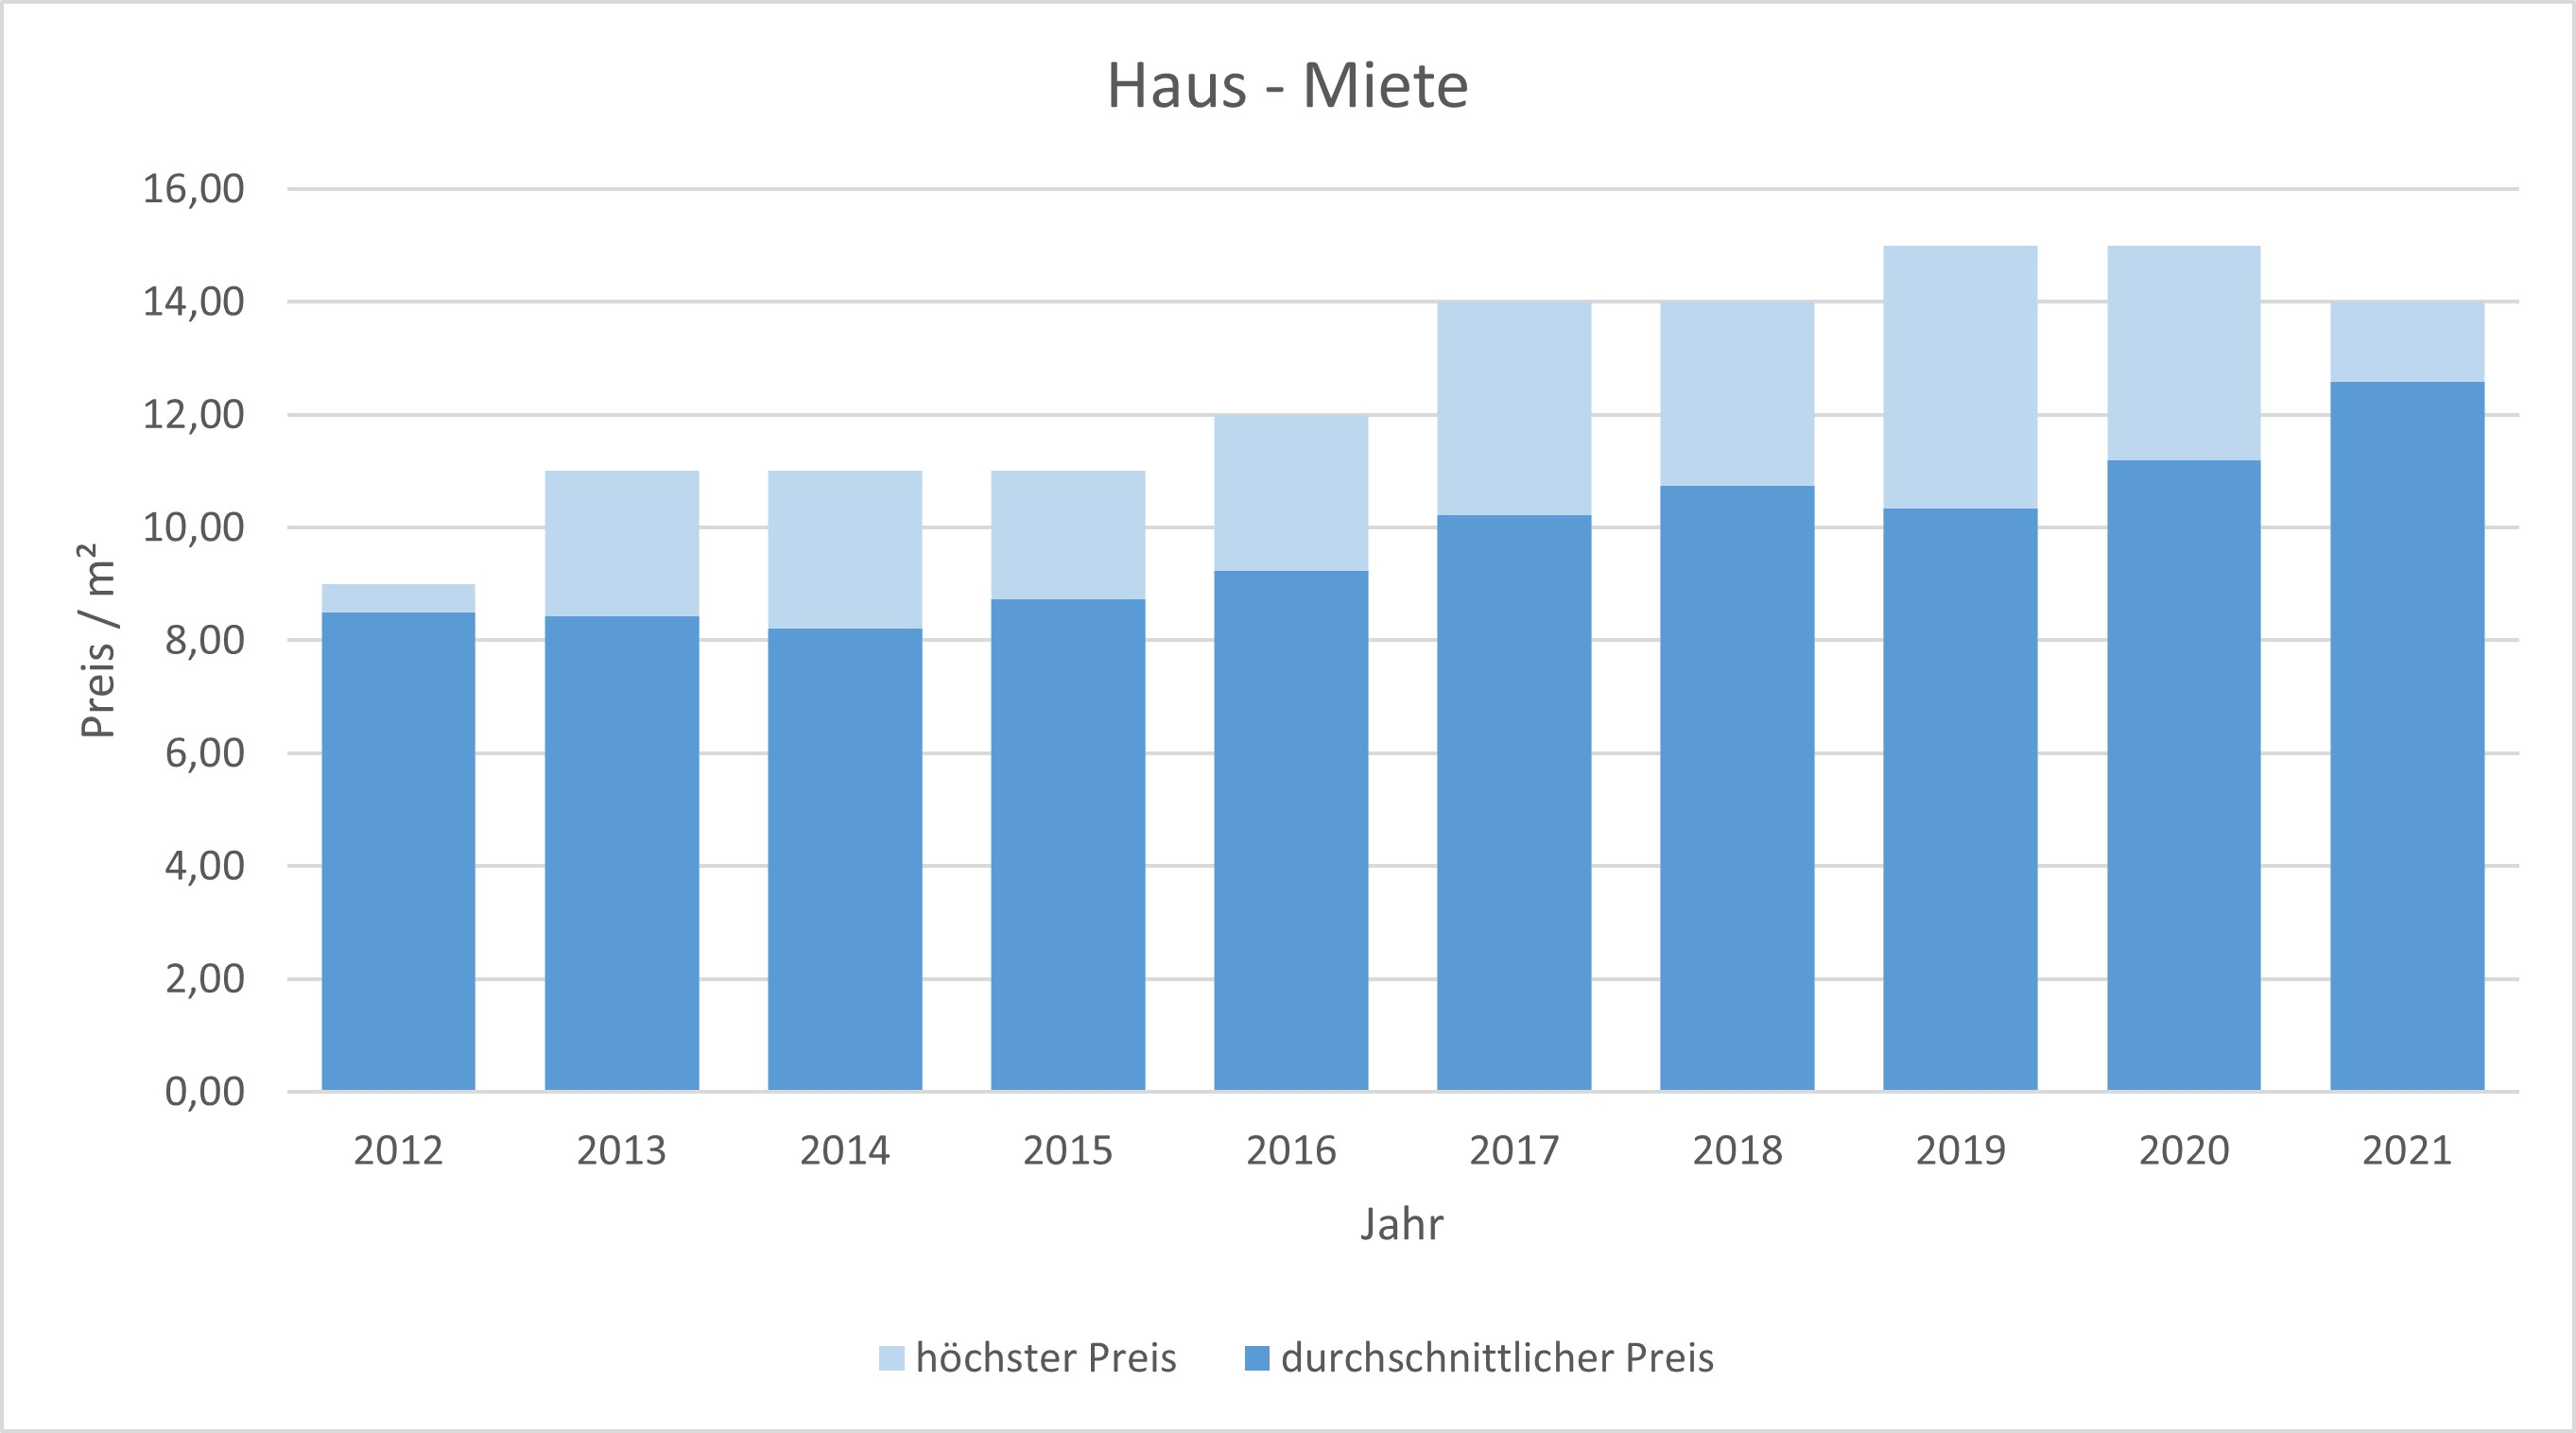 Bruckmühl Haus mieten vermieten preis bewertung makler www.happy-immo.de 2019 2020 2021